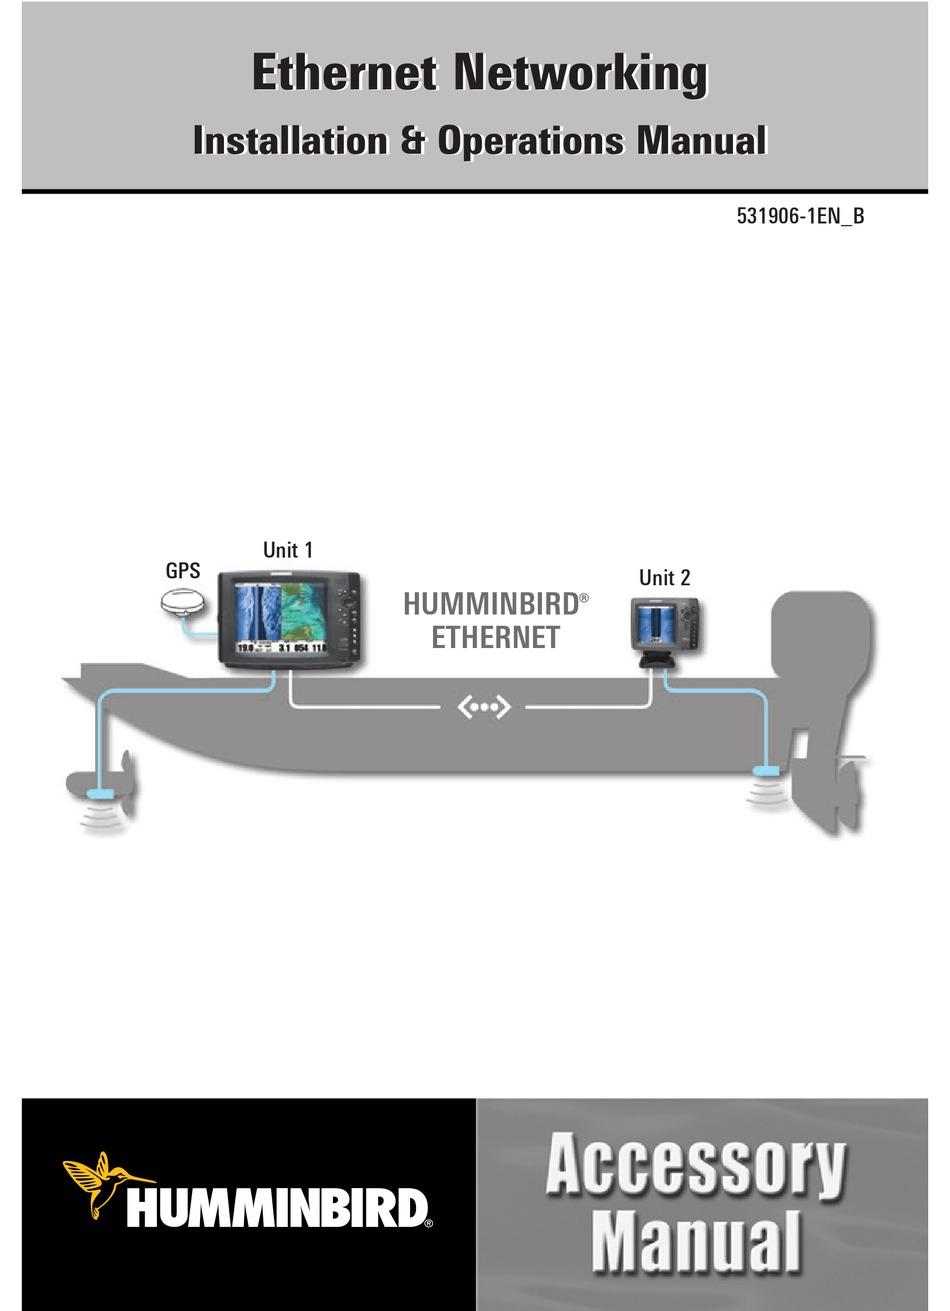 HUMMINBIRD 40 SERIES INSTALLATION & OPERATION MANUAL Pdf Download ...